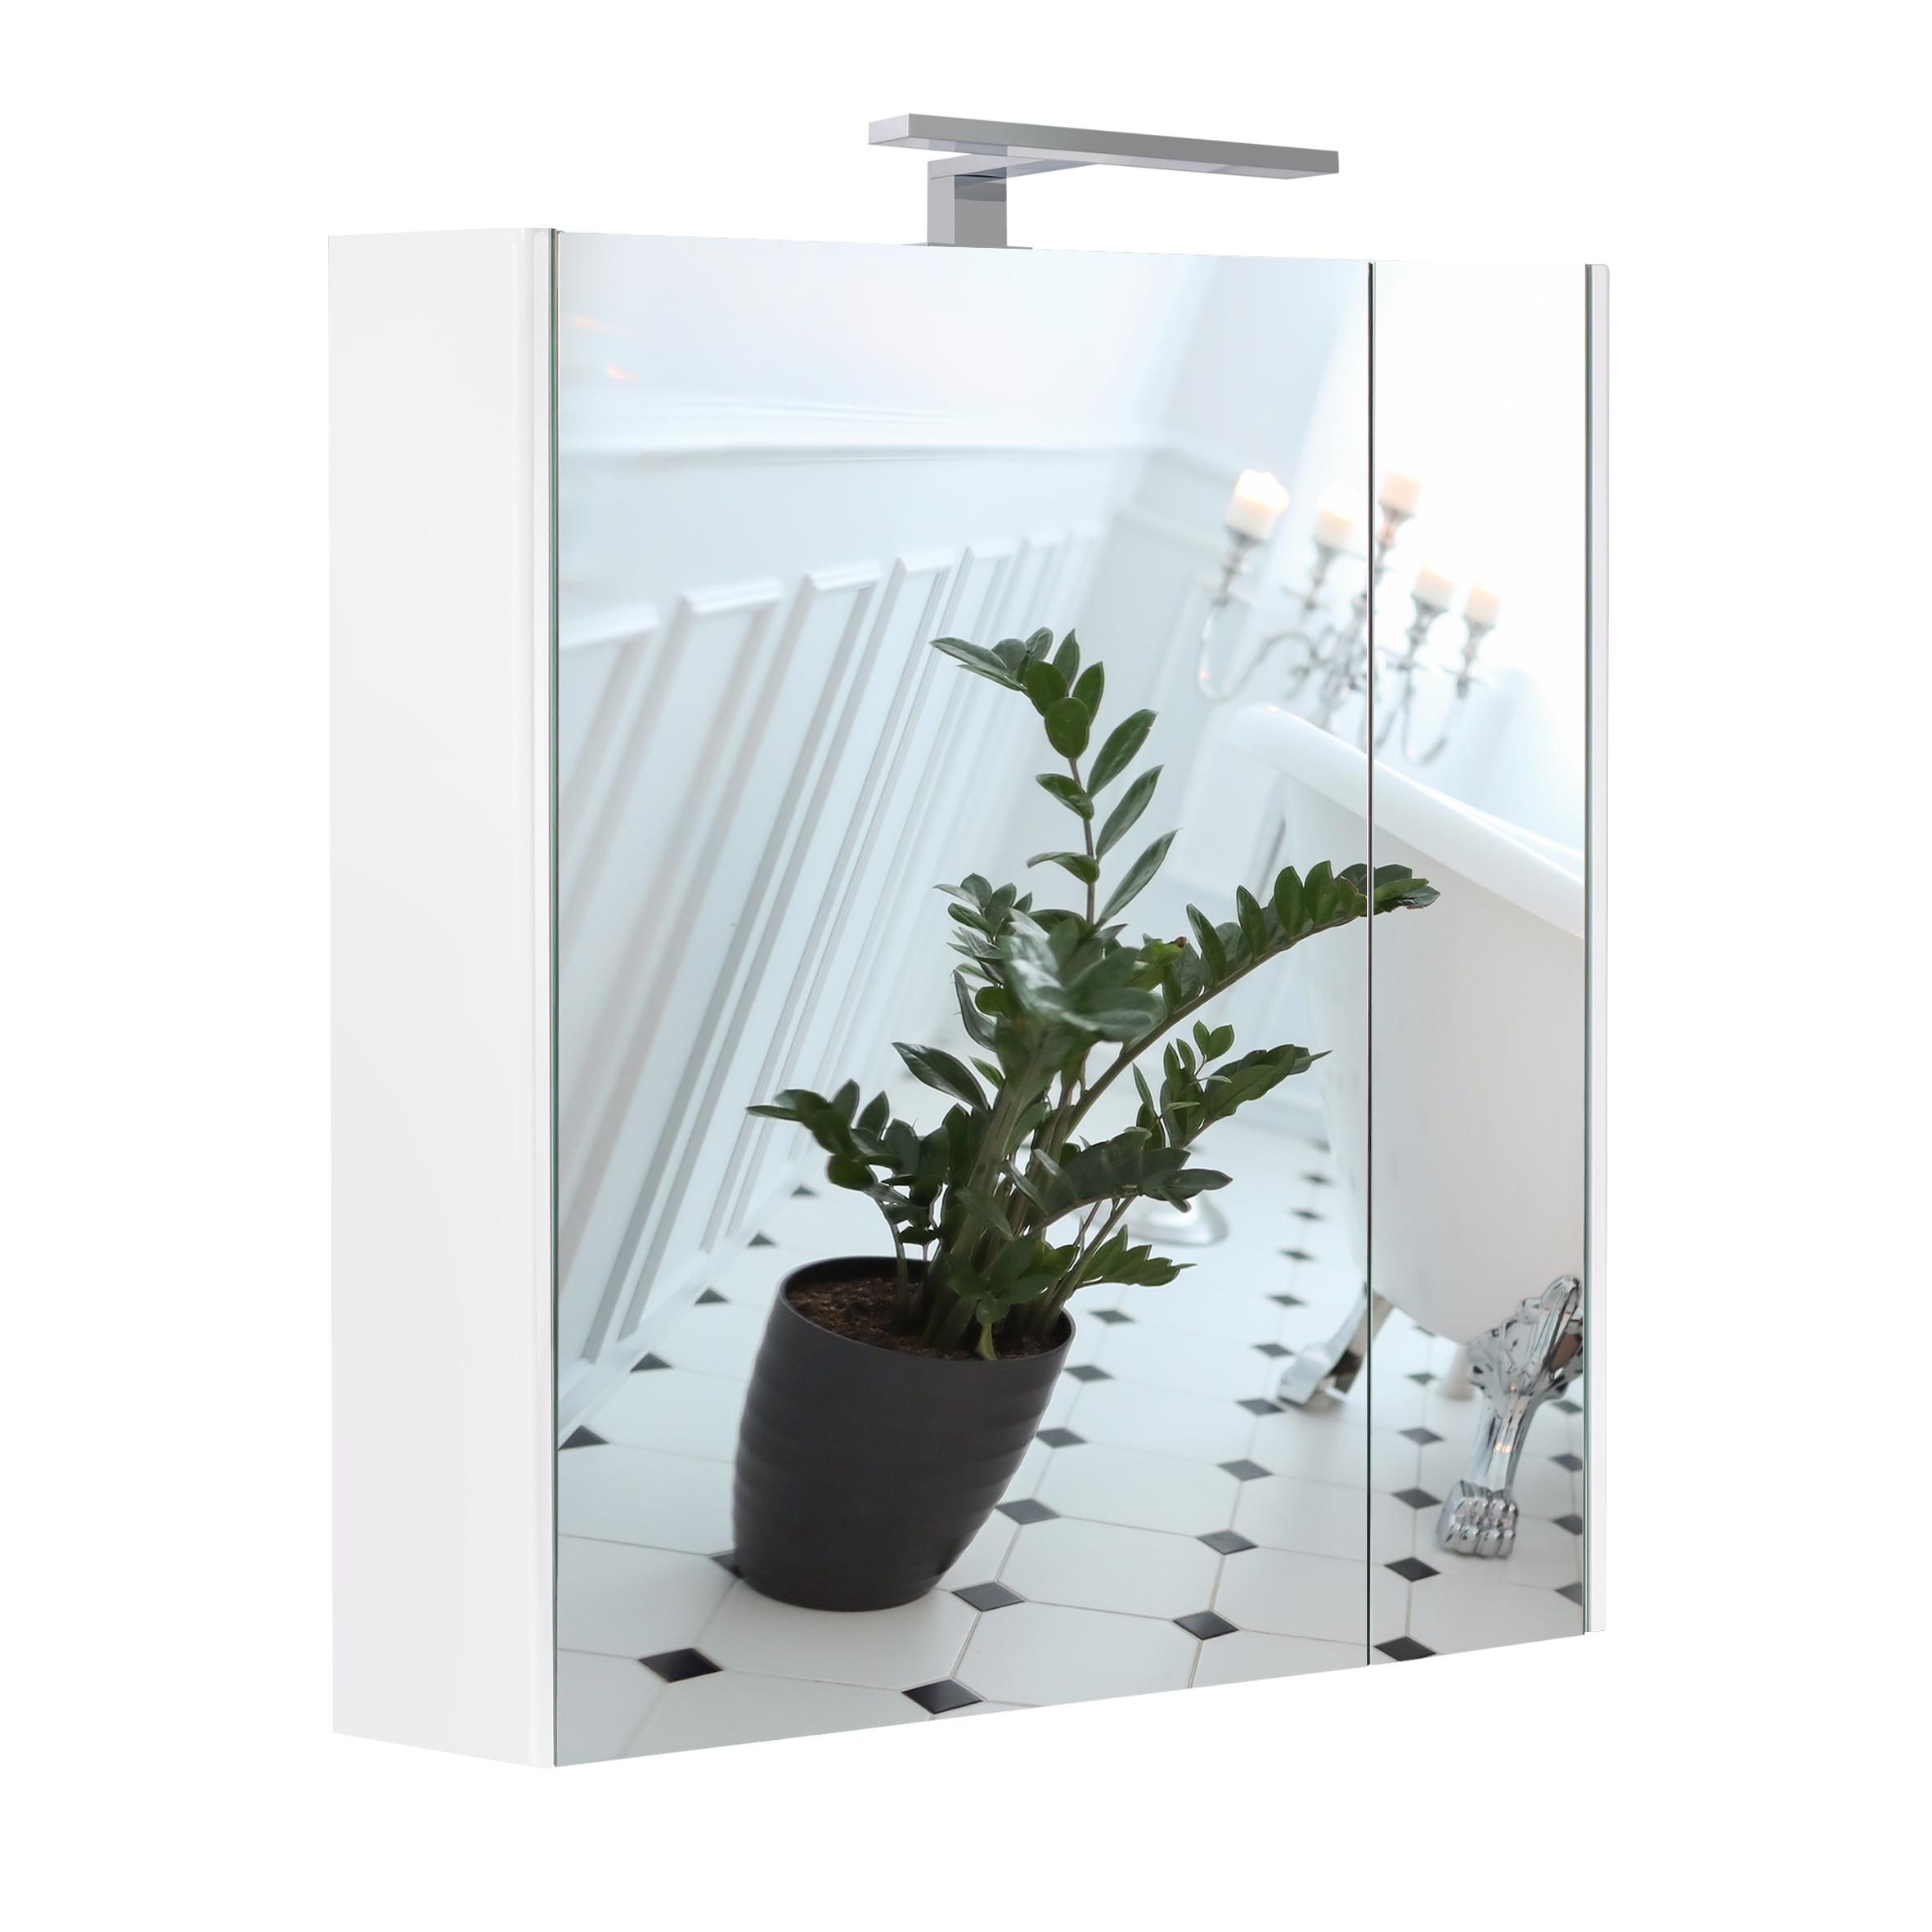 Зеркальный шкаф подвесной Qtap Albatross 700х725х460 White с LED-подсветкой QT0177ZP700LW